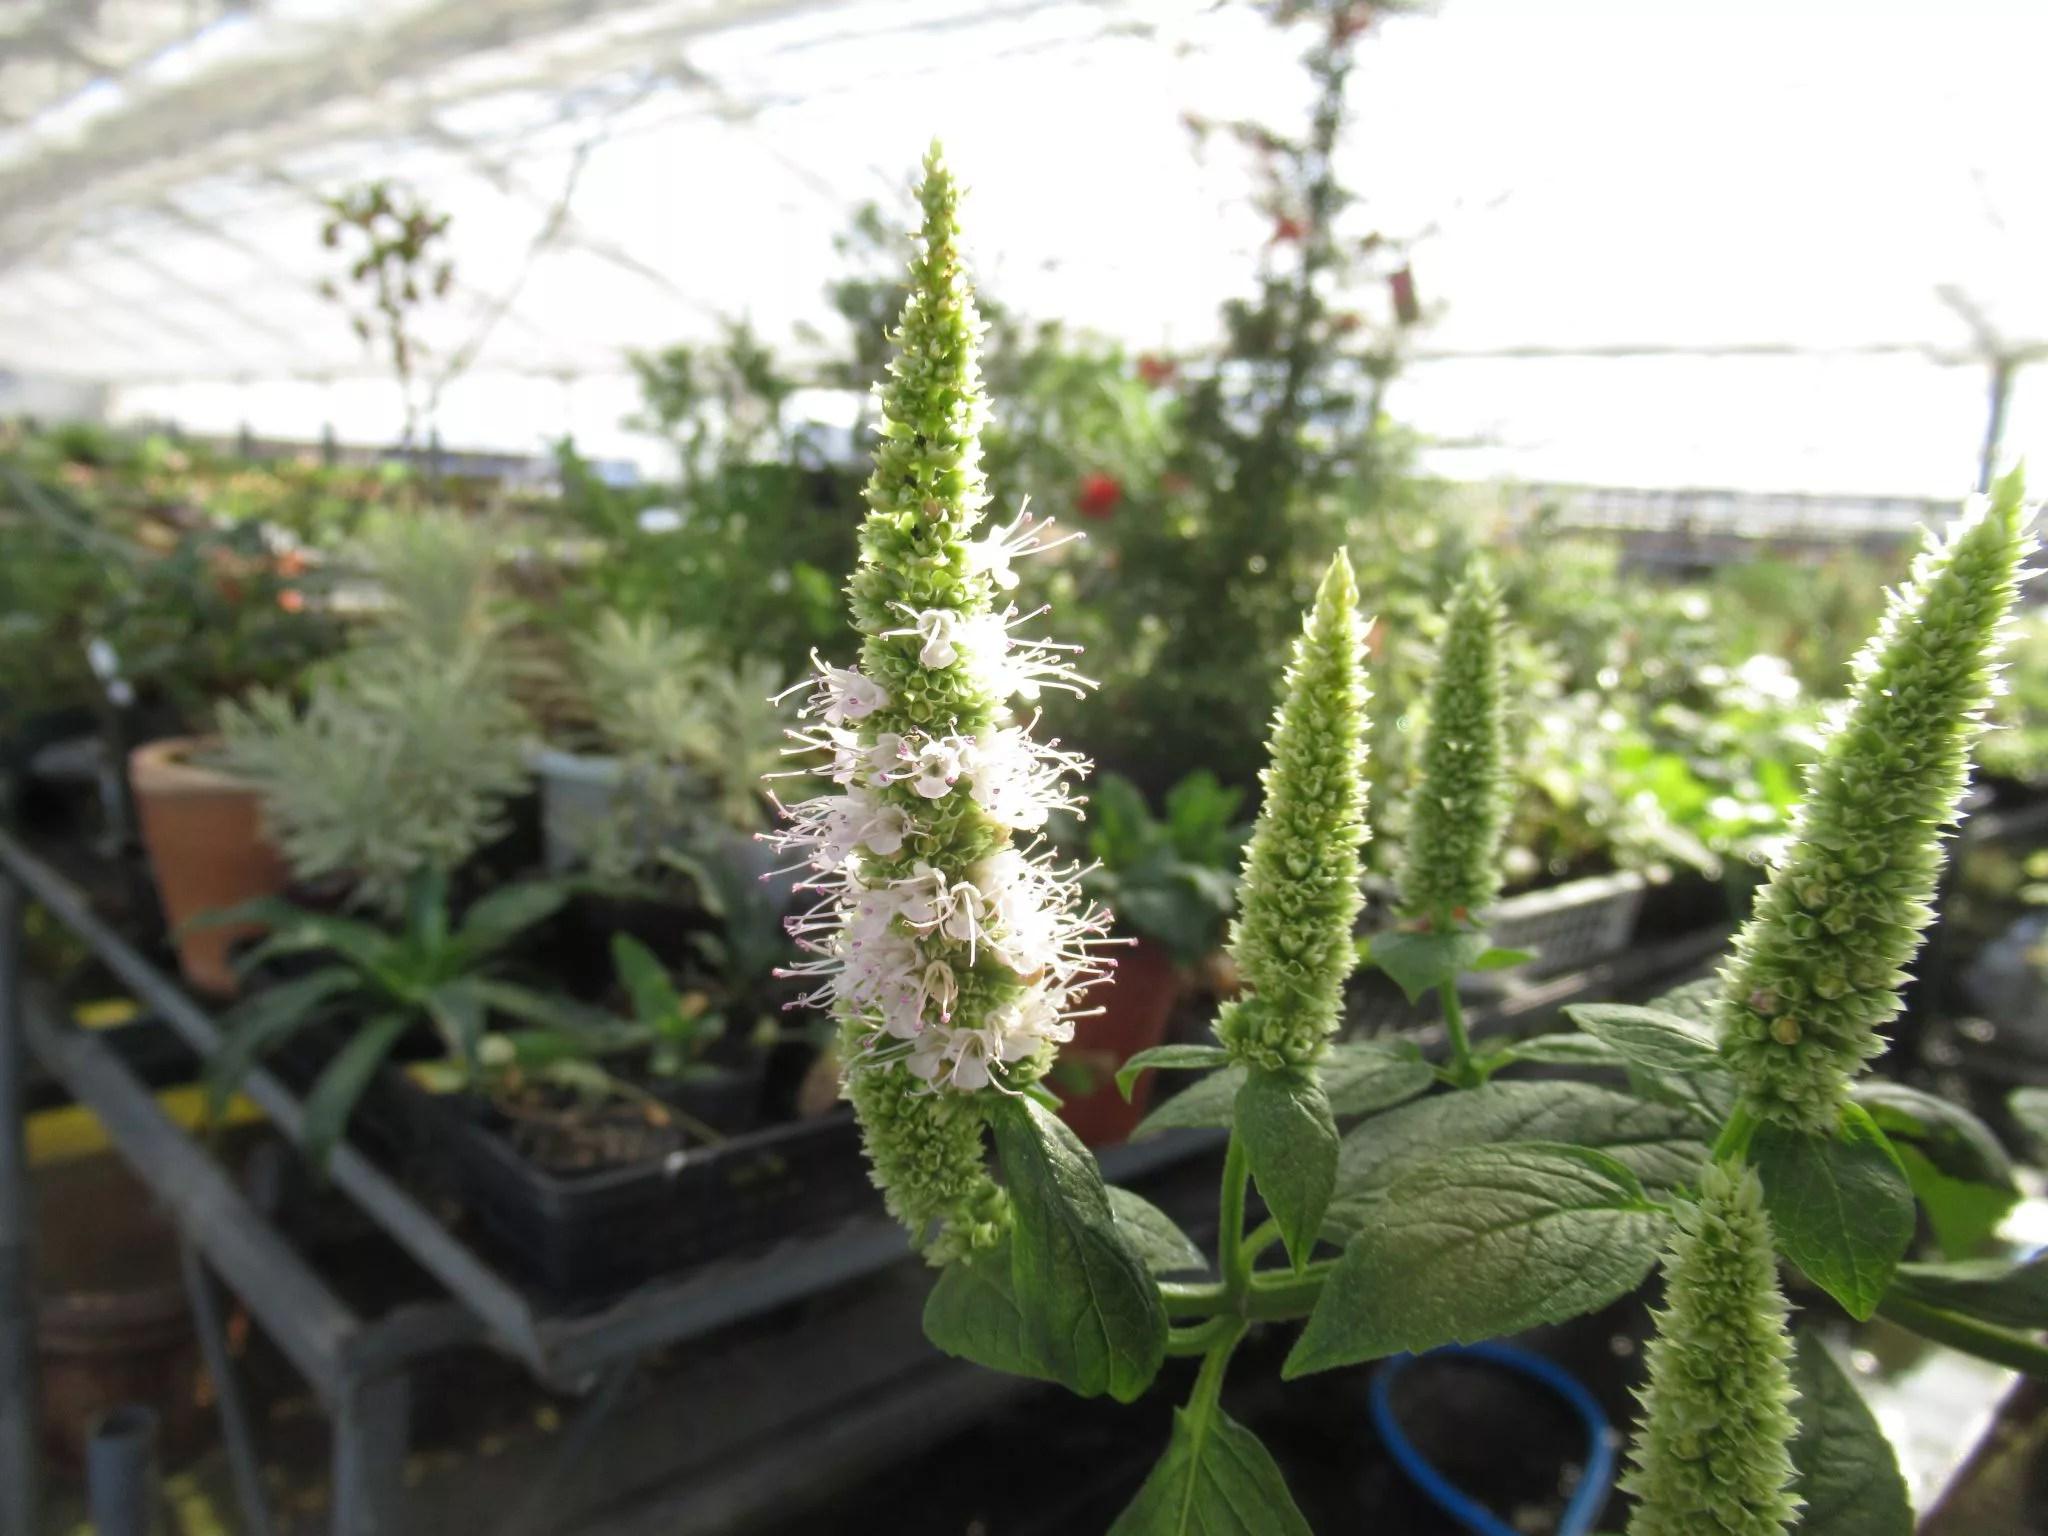 agastache nepetoides アガスターシェ ネペトイデス の花です。